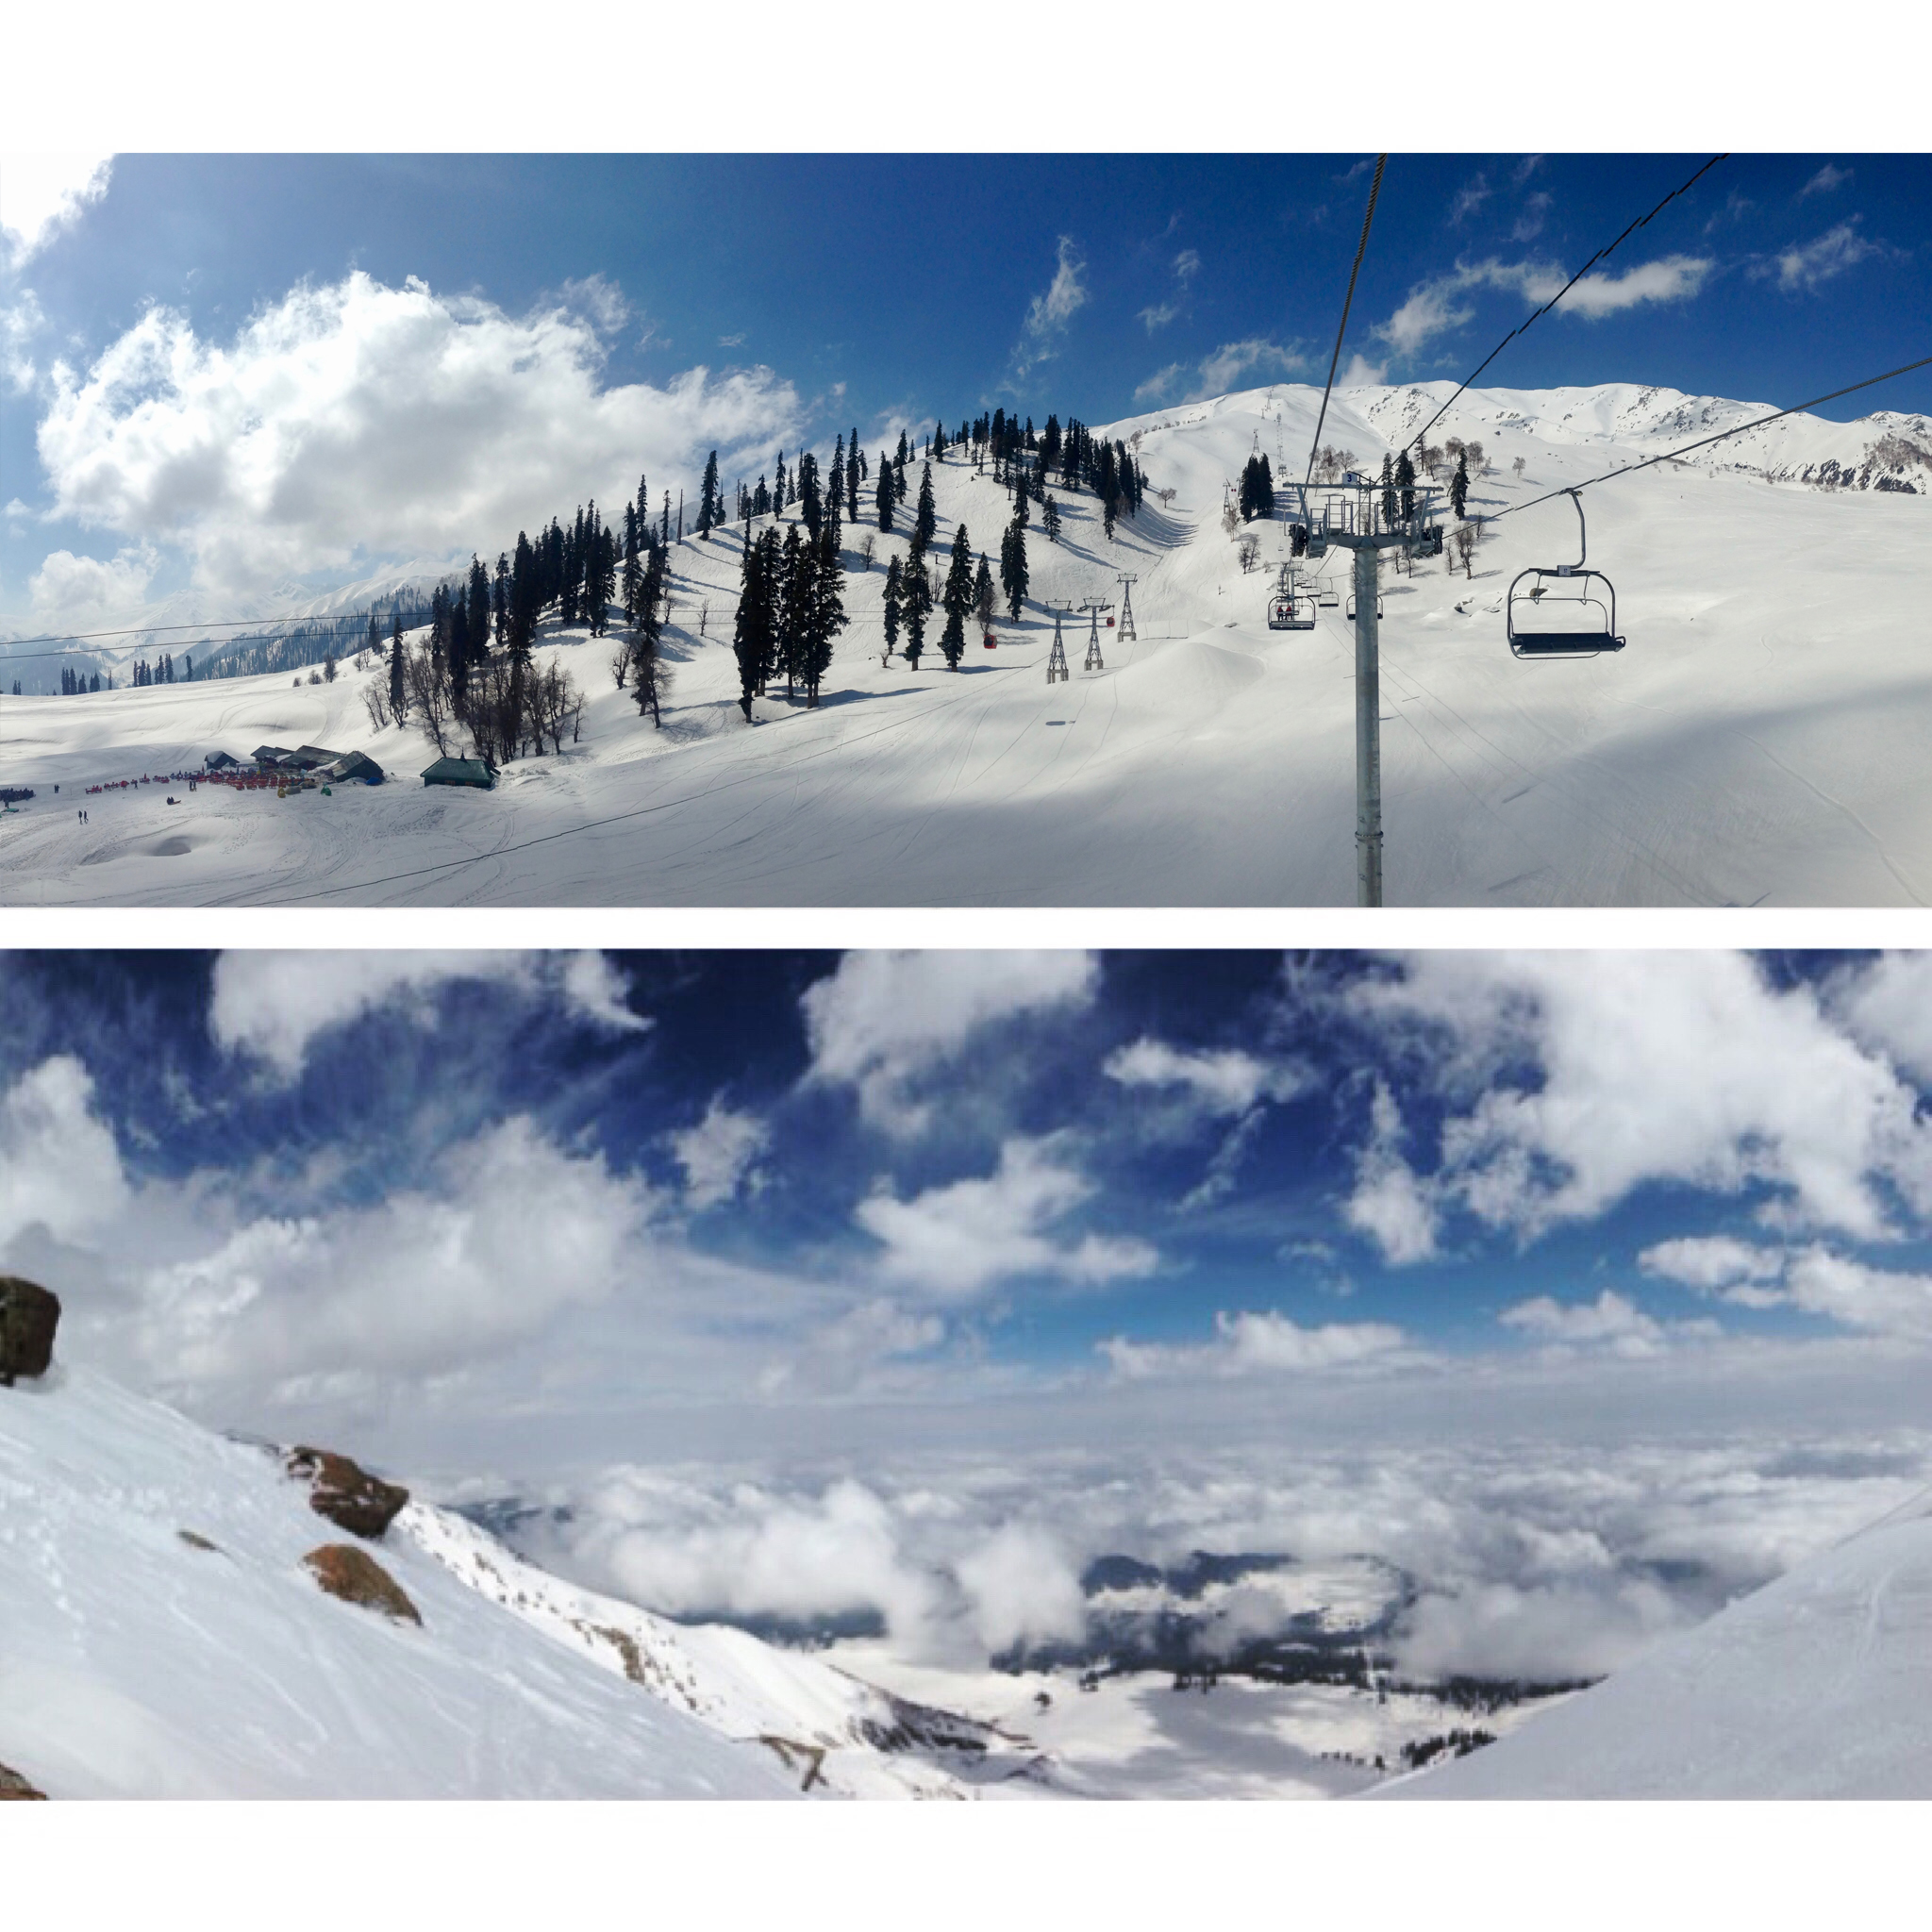 Snowboarding on Kongdori Mountain Gulmarg, Kashmir, Himalayas.